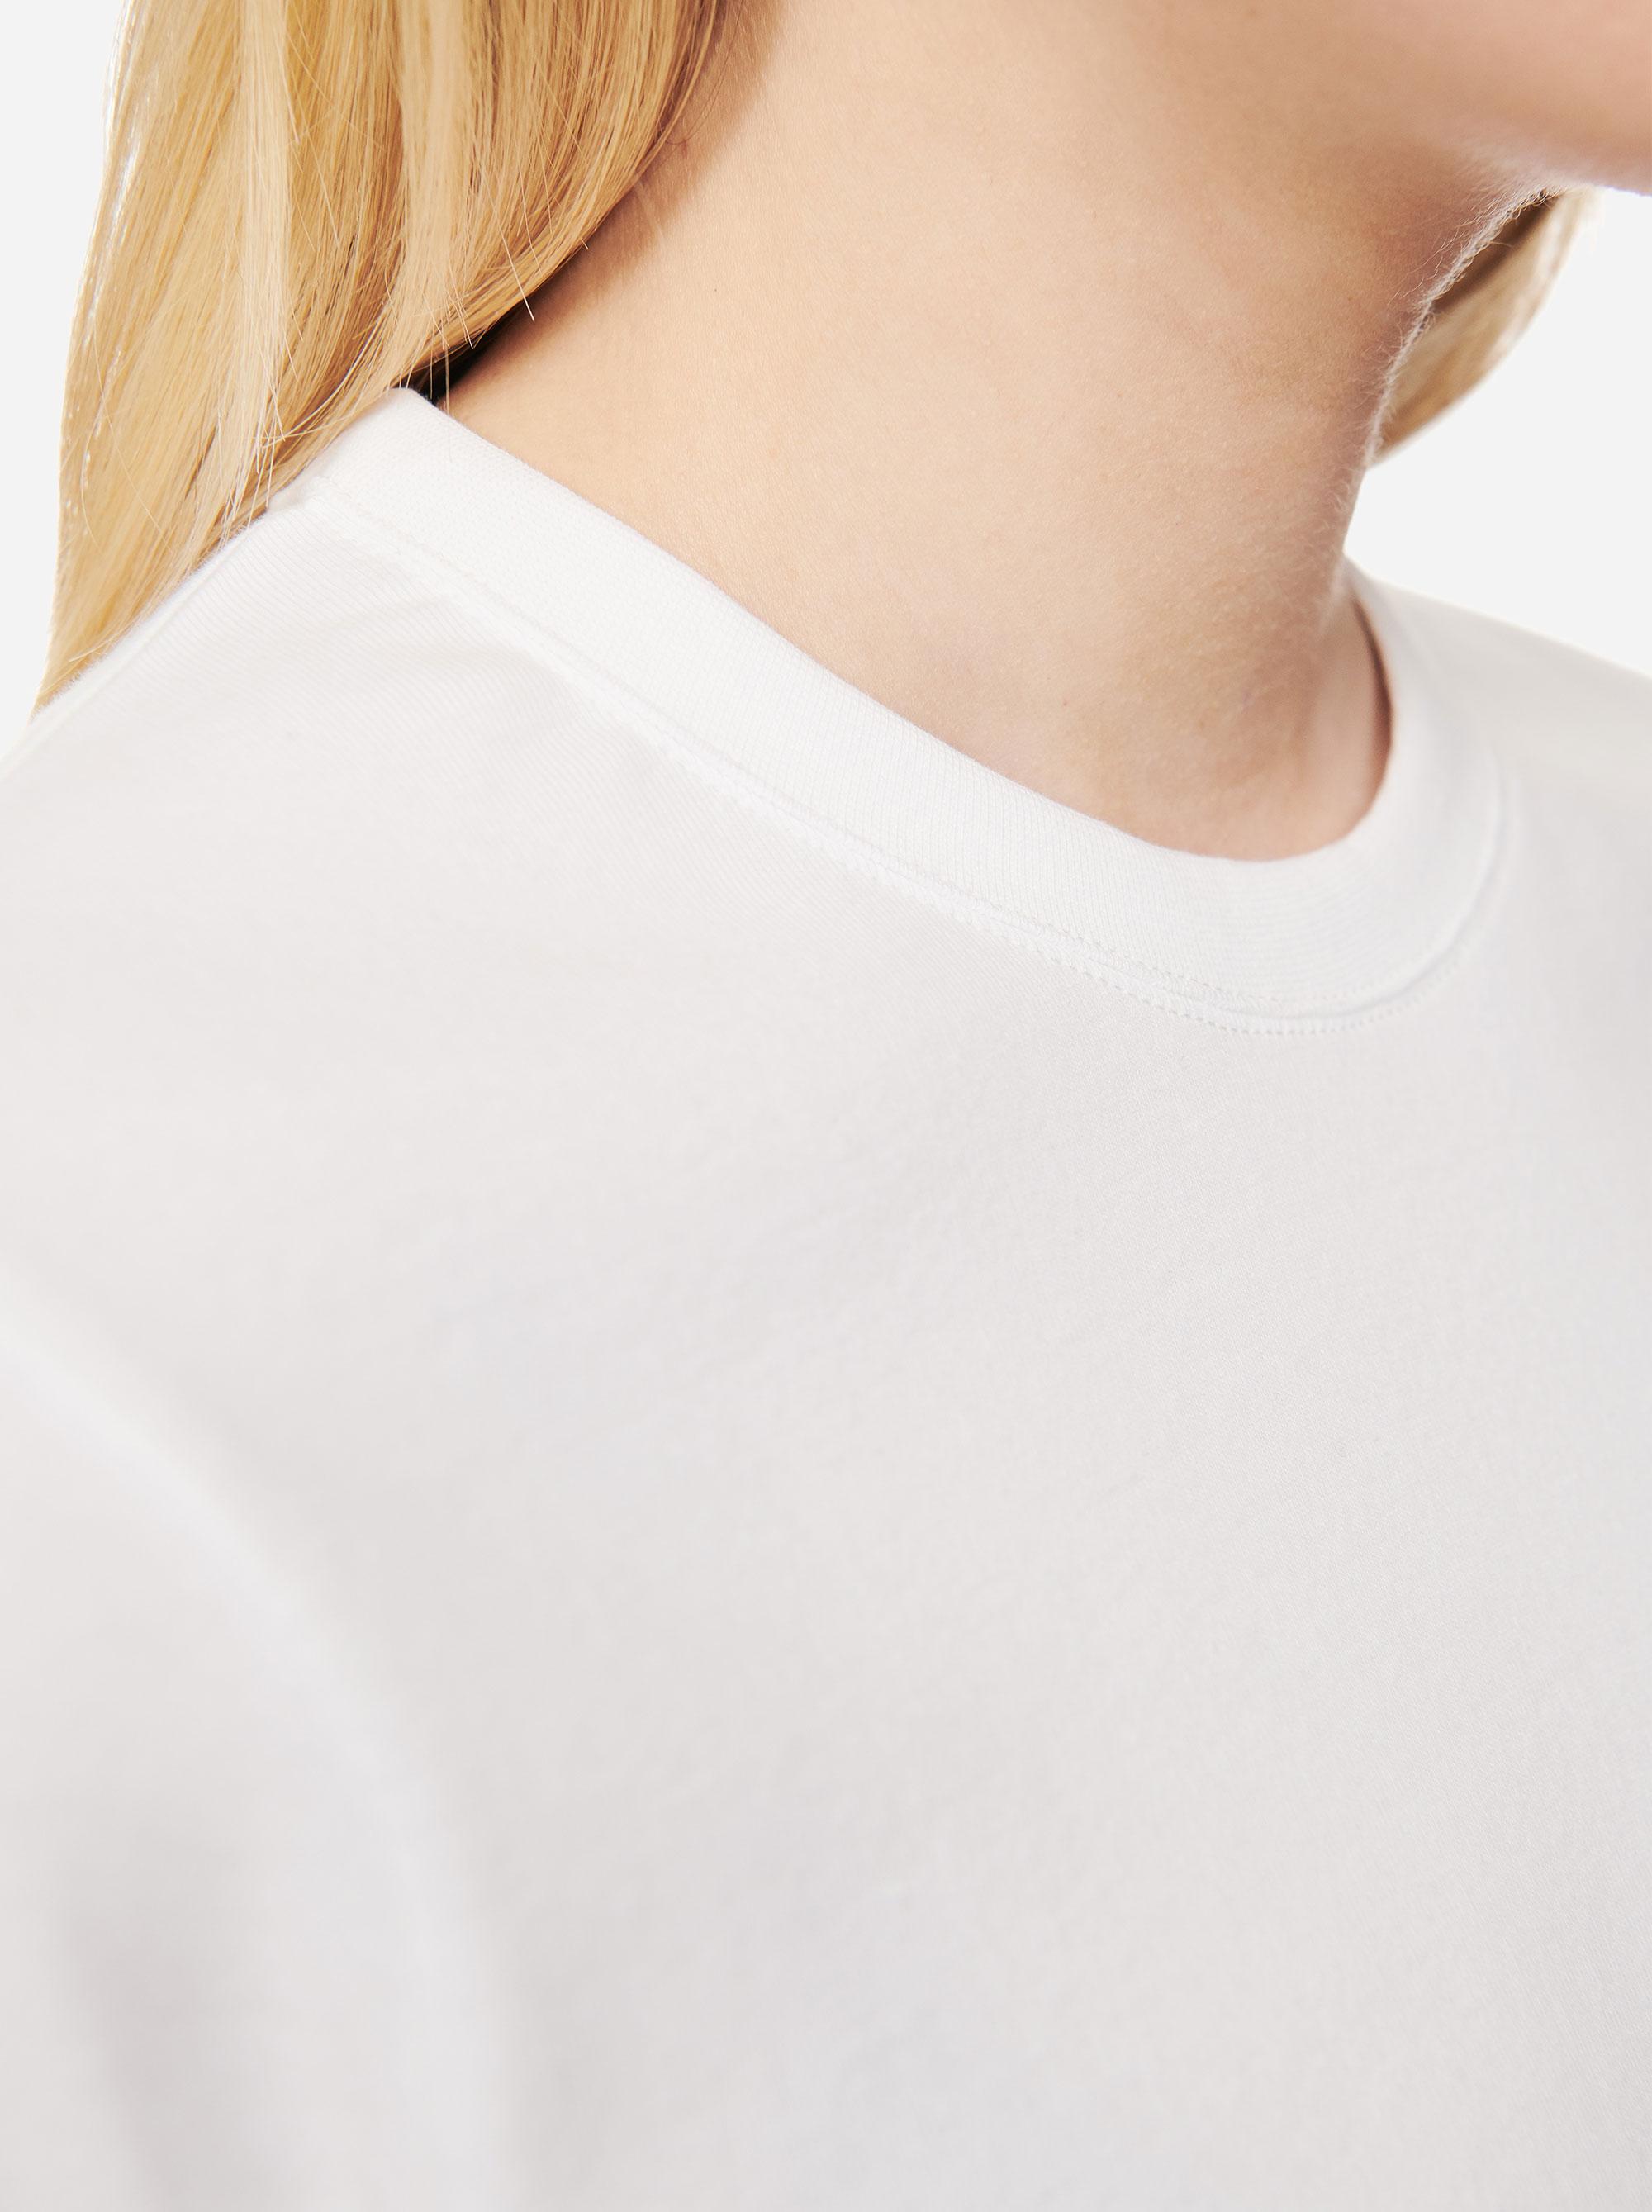 Teym - The T-Shirt - Women - White - 3